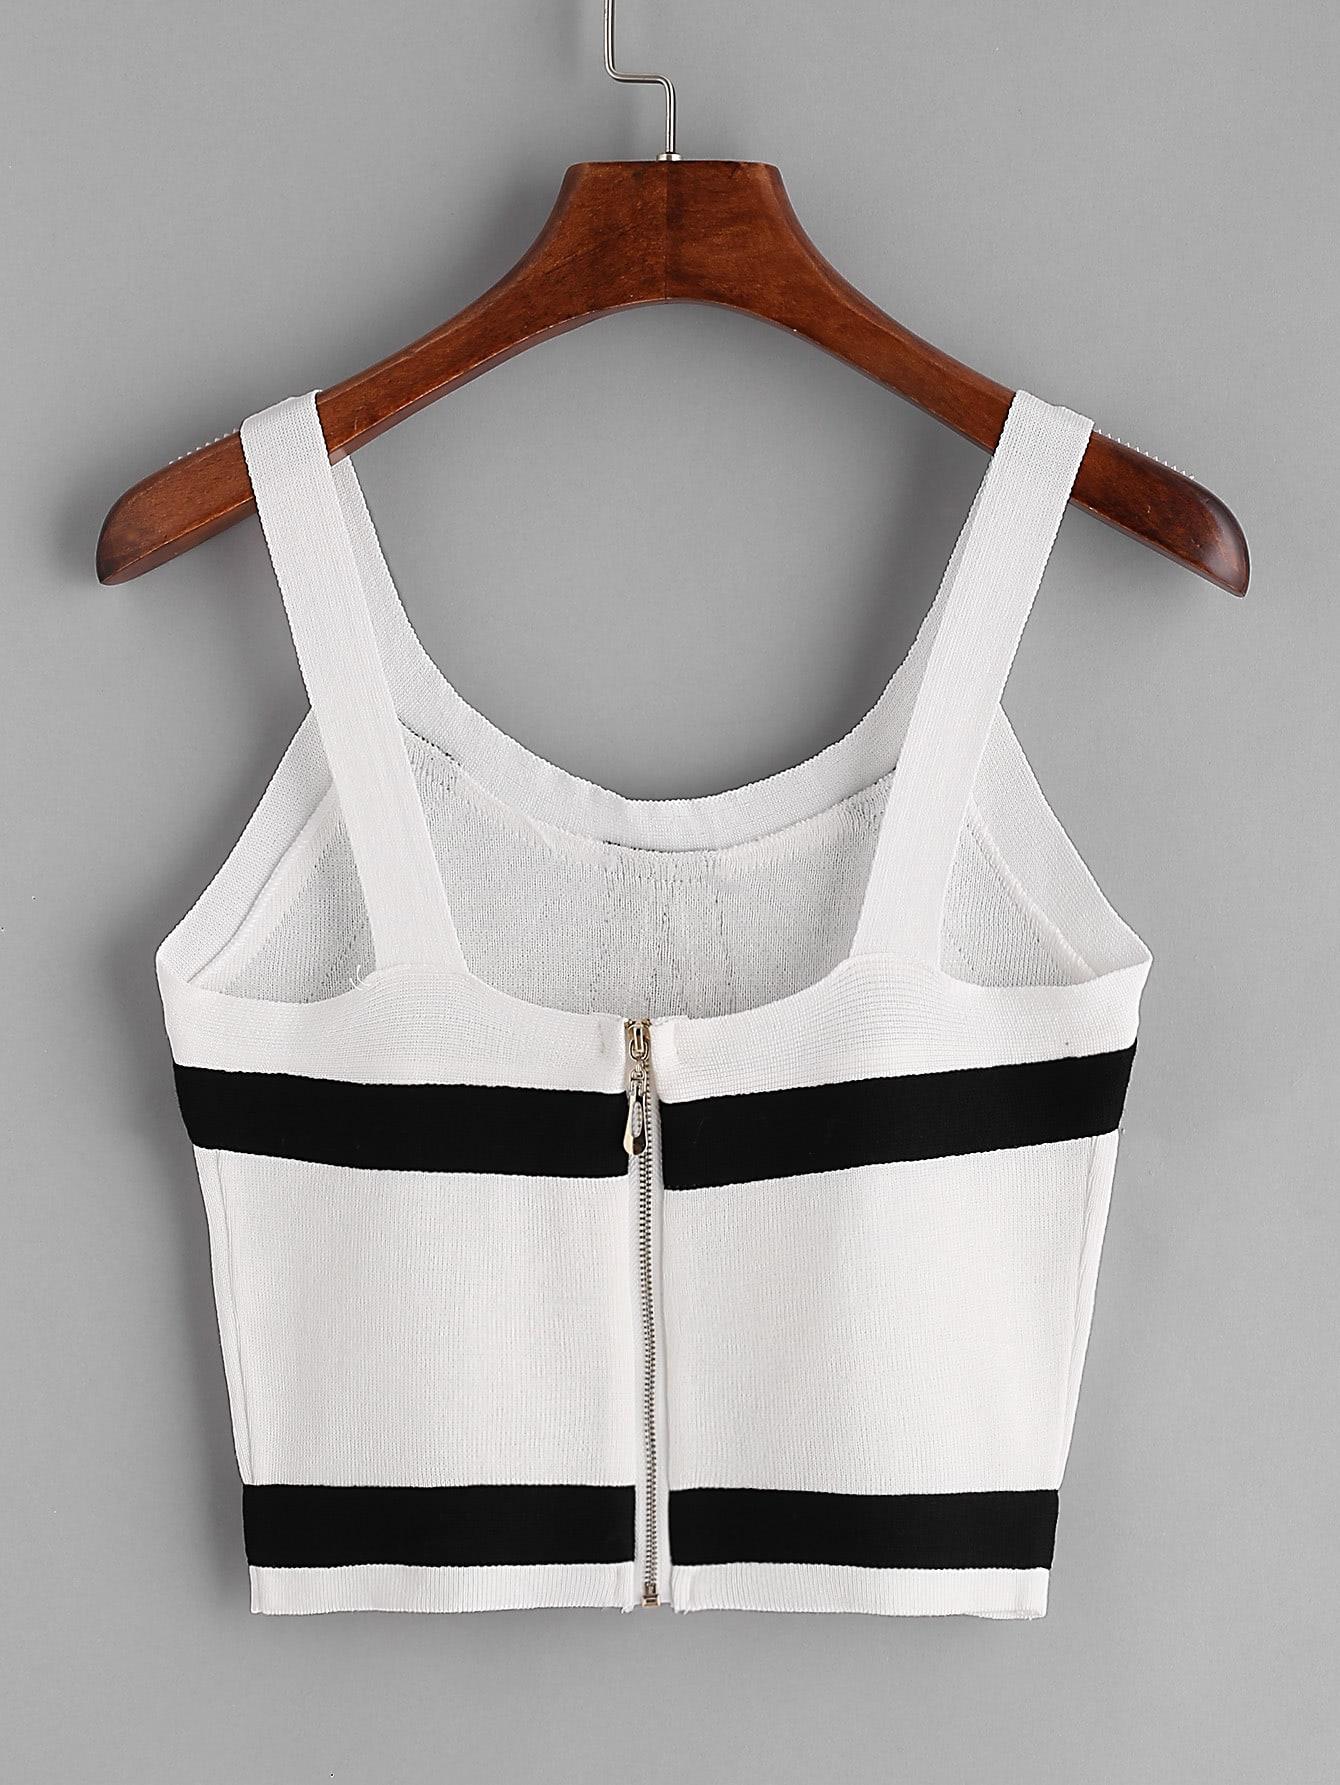 0aed3db075d58 Cheap Striped Zipper Back Knit Crop Tank Top for sale Australia | SHEIN